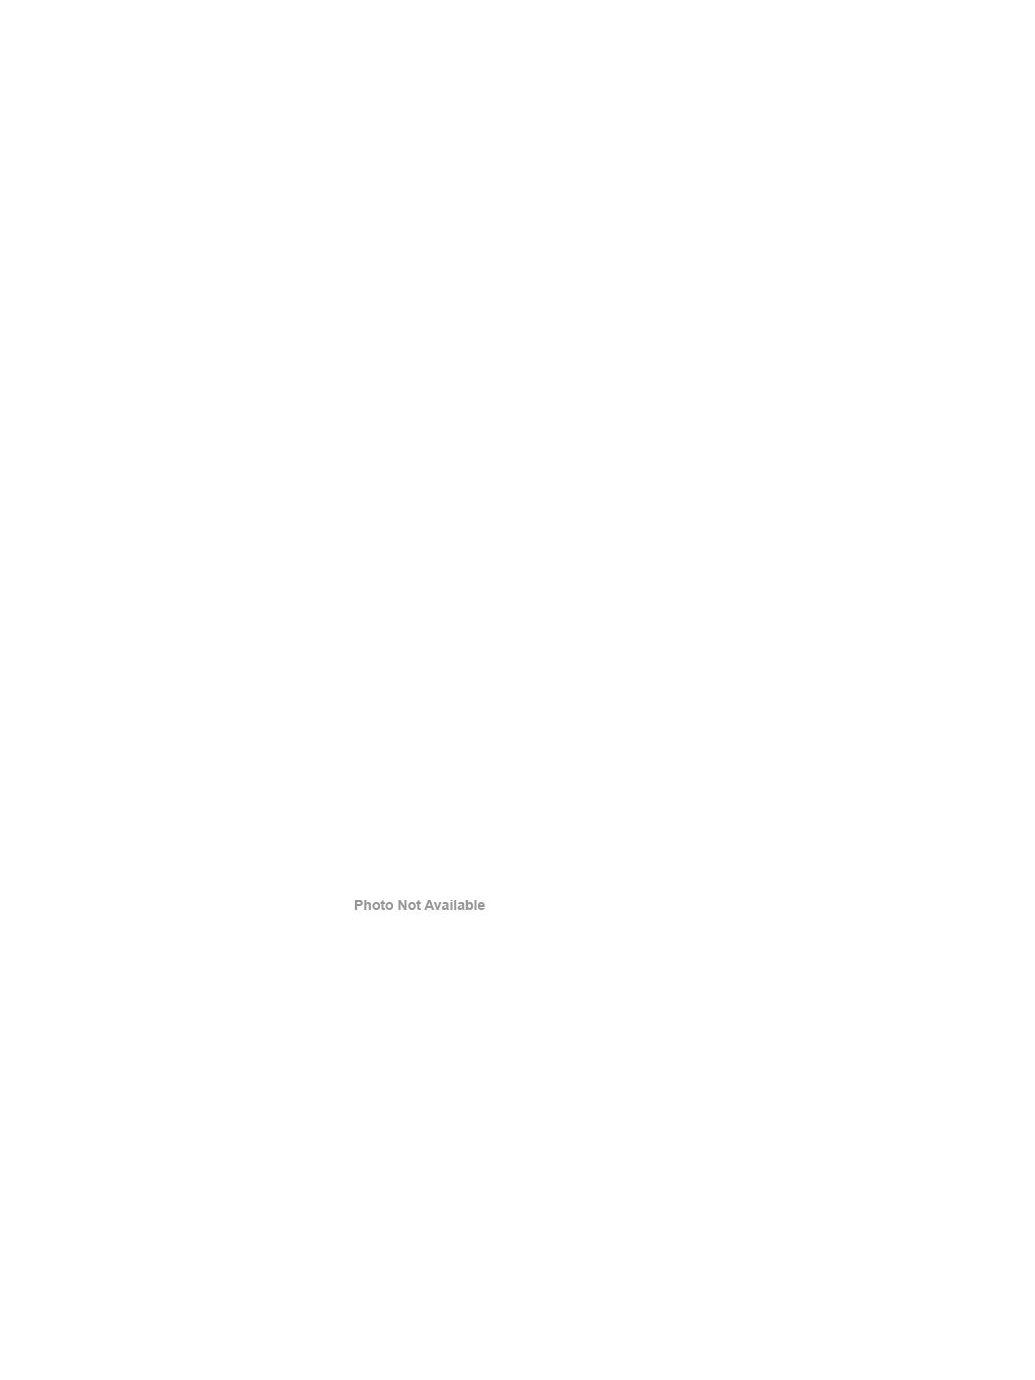 Plaid Tennis Skirt | American Apparel